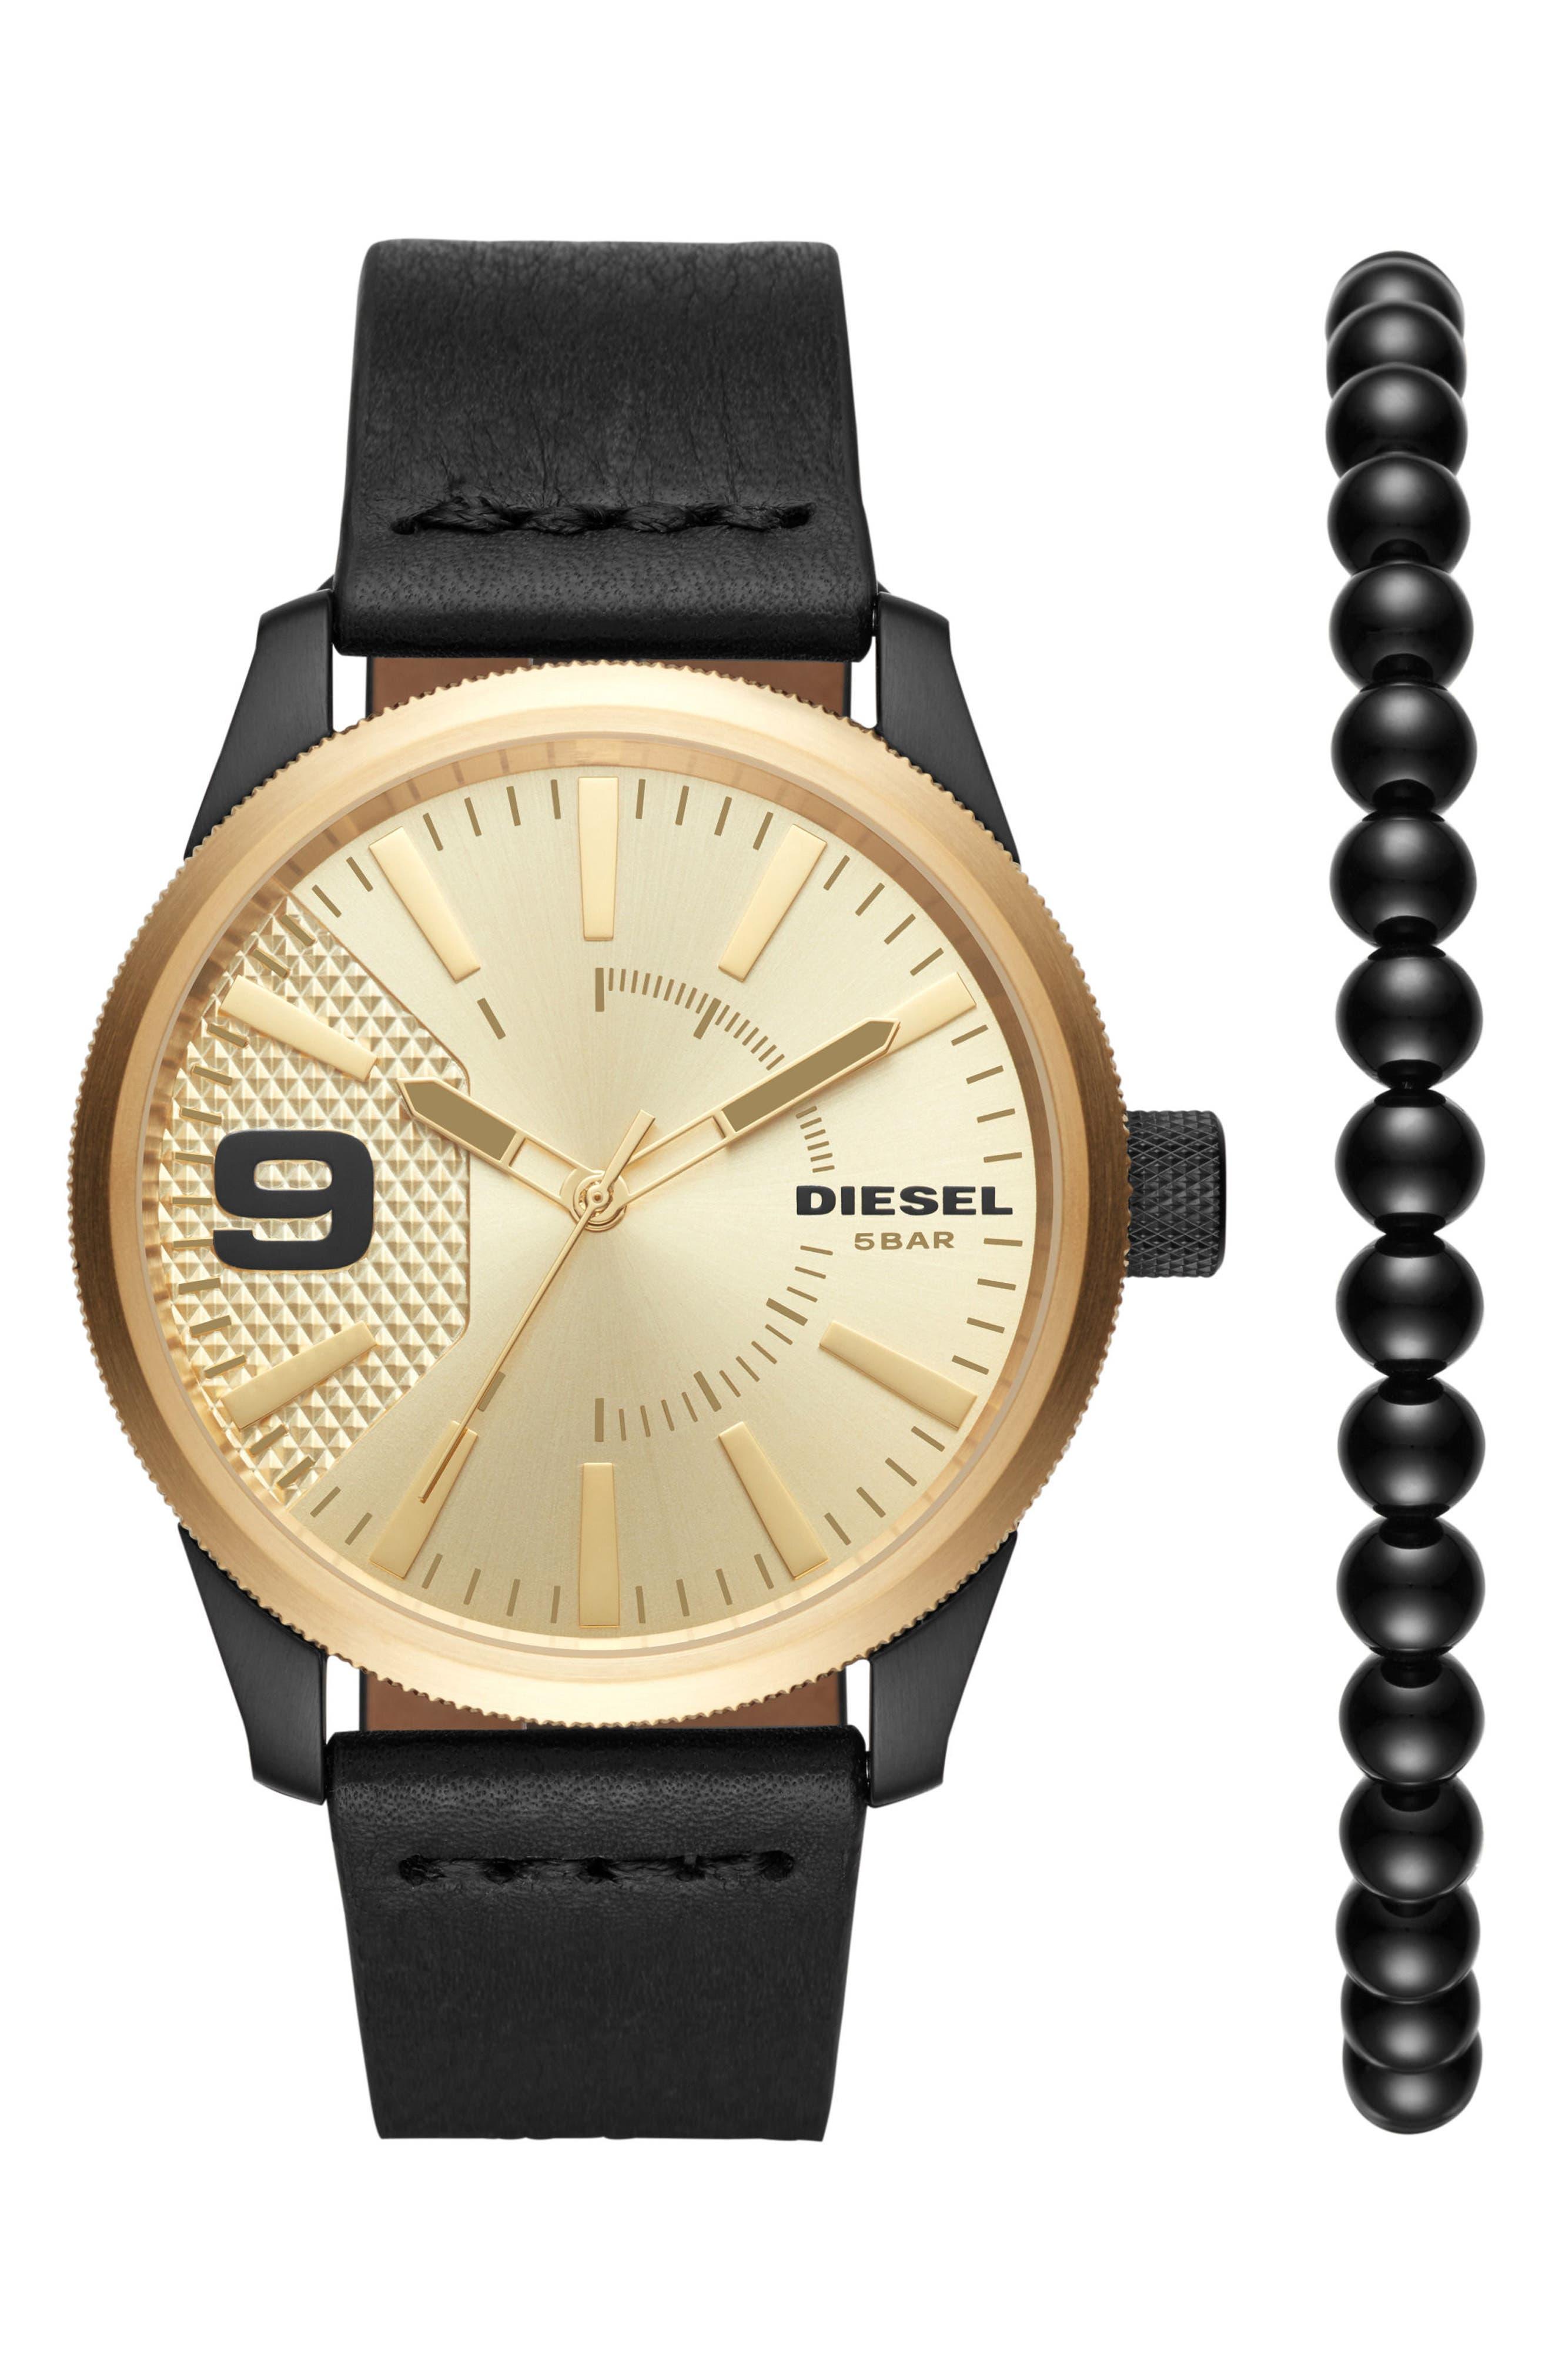 Alternate Image 1 Selected - DIESEL® Rasp Leather Strap Watch & Bracelet Set, 46mm x 53mm